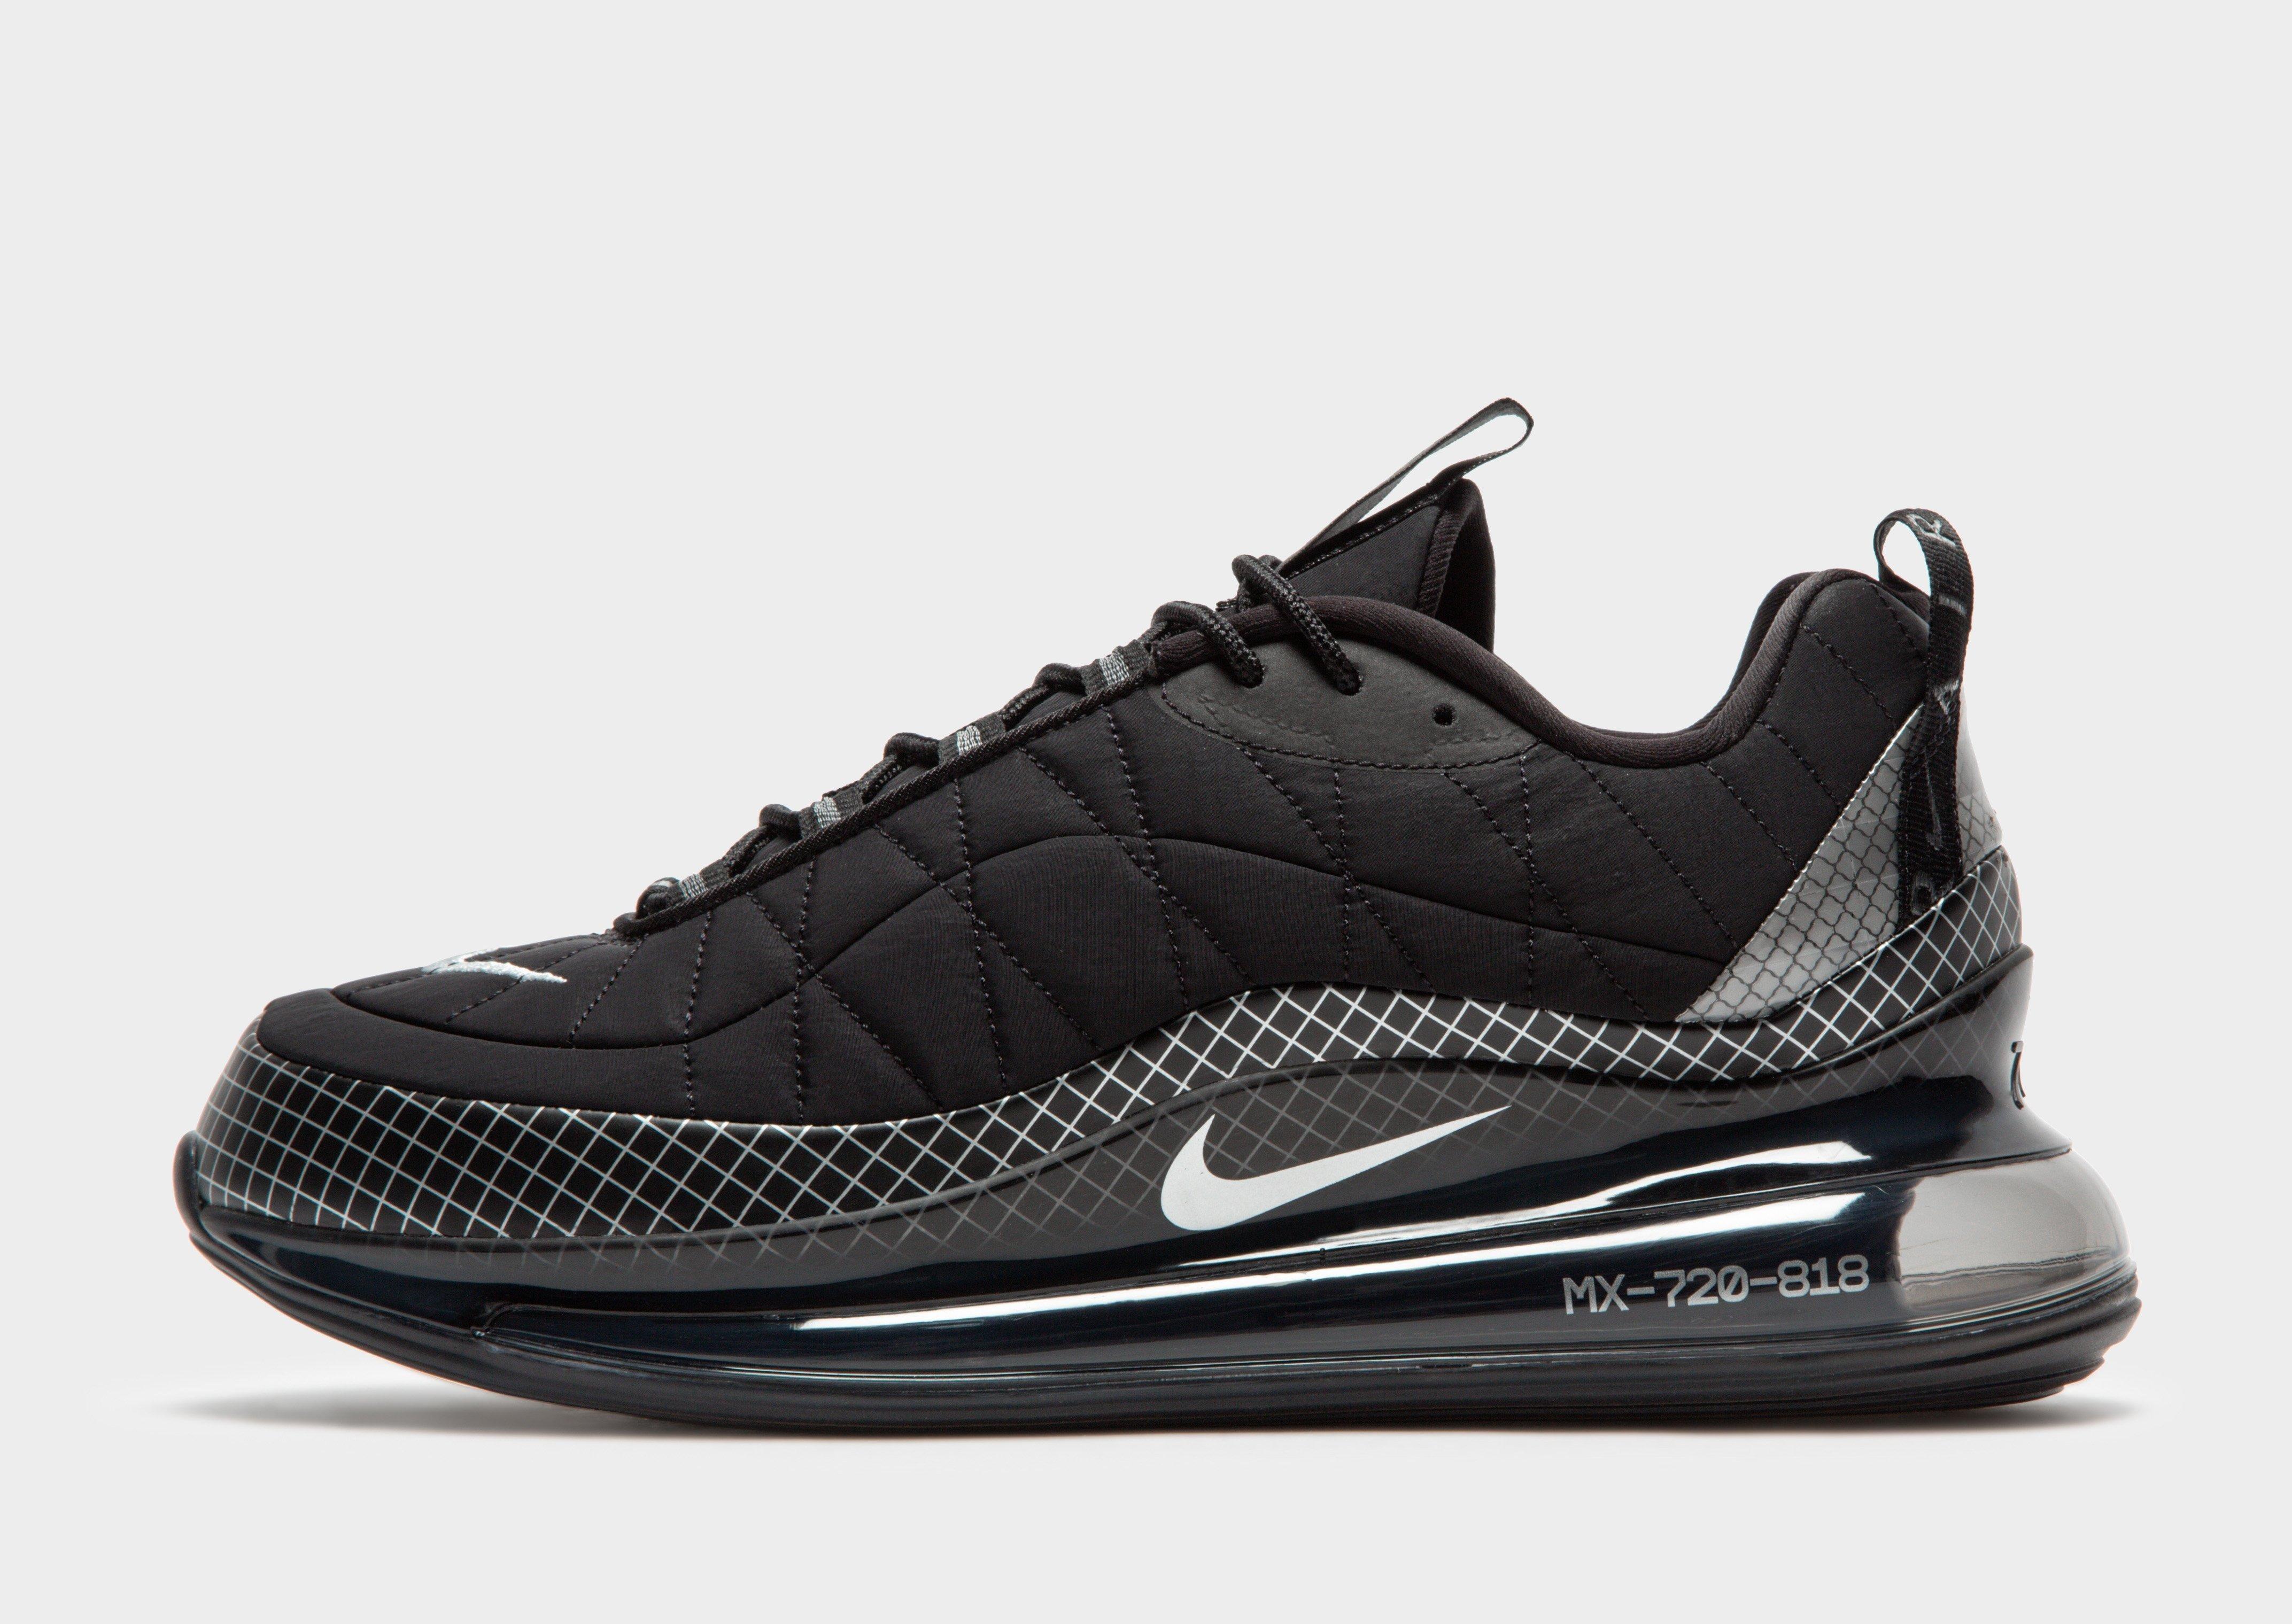 Nike Air Max 720 818 | JD Sports